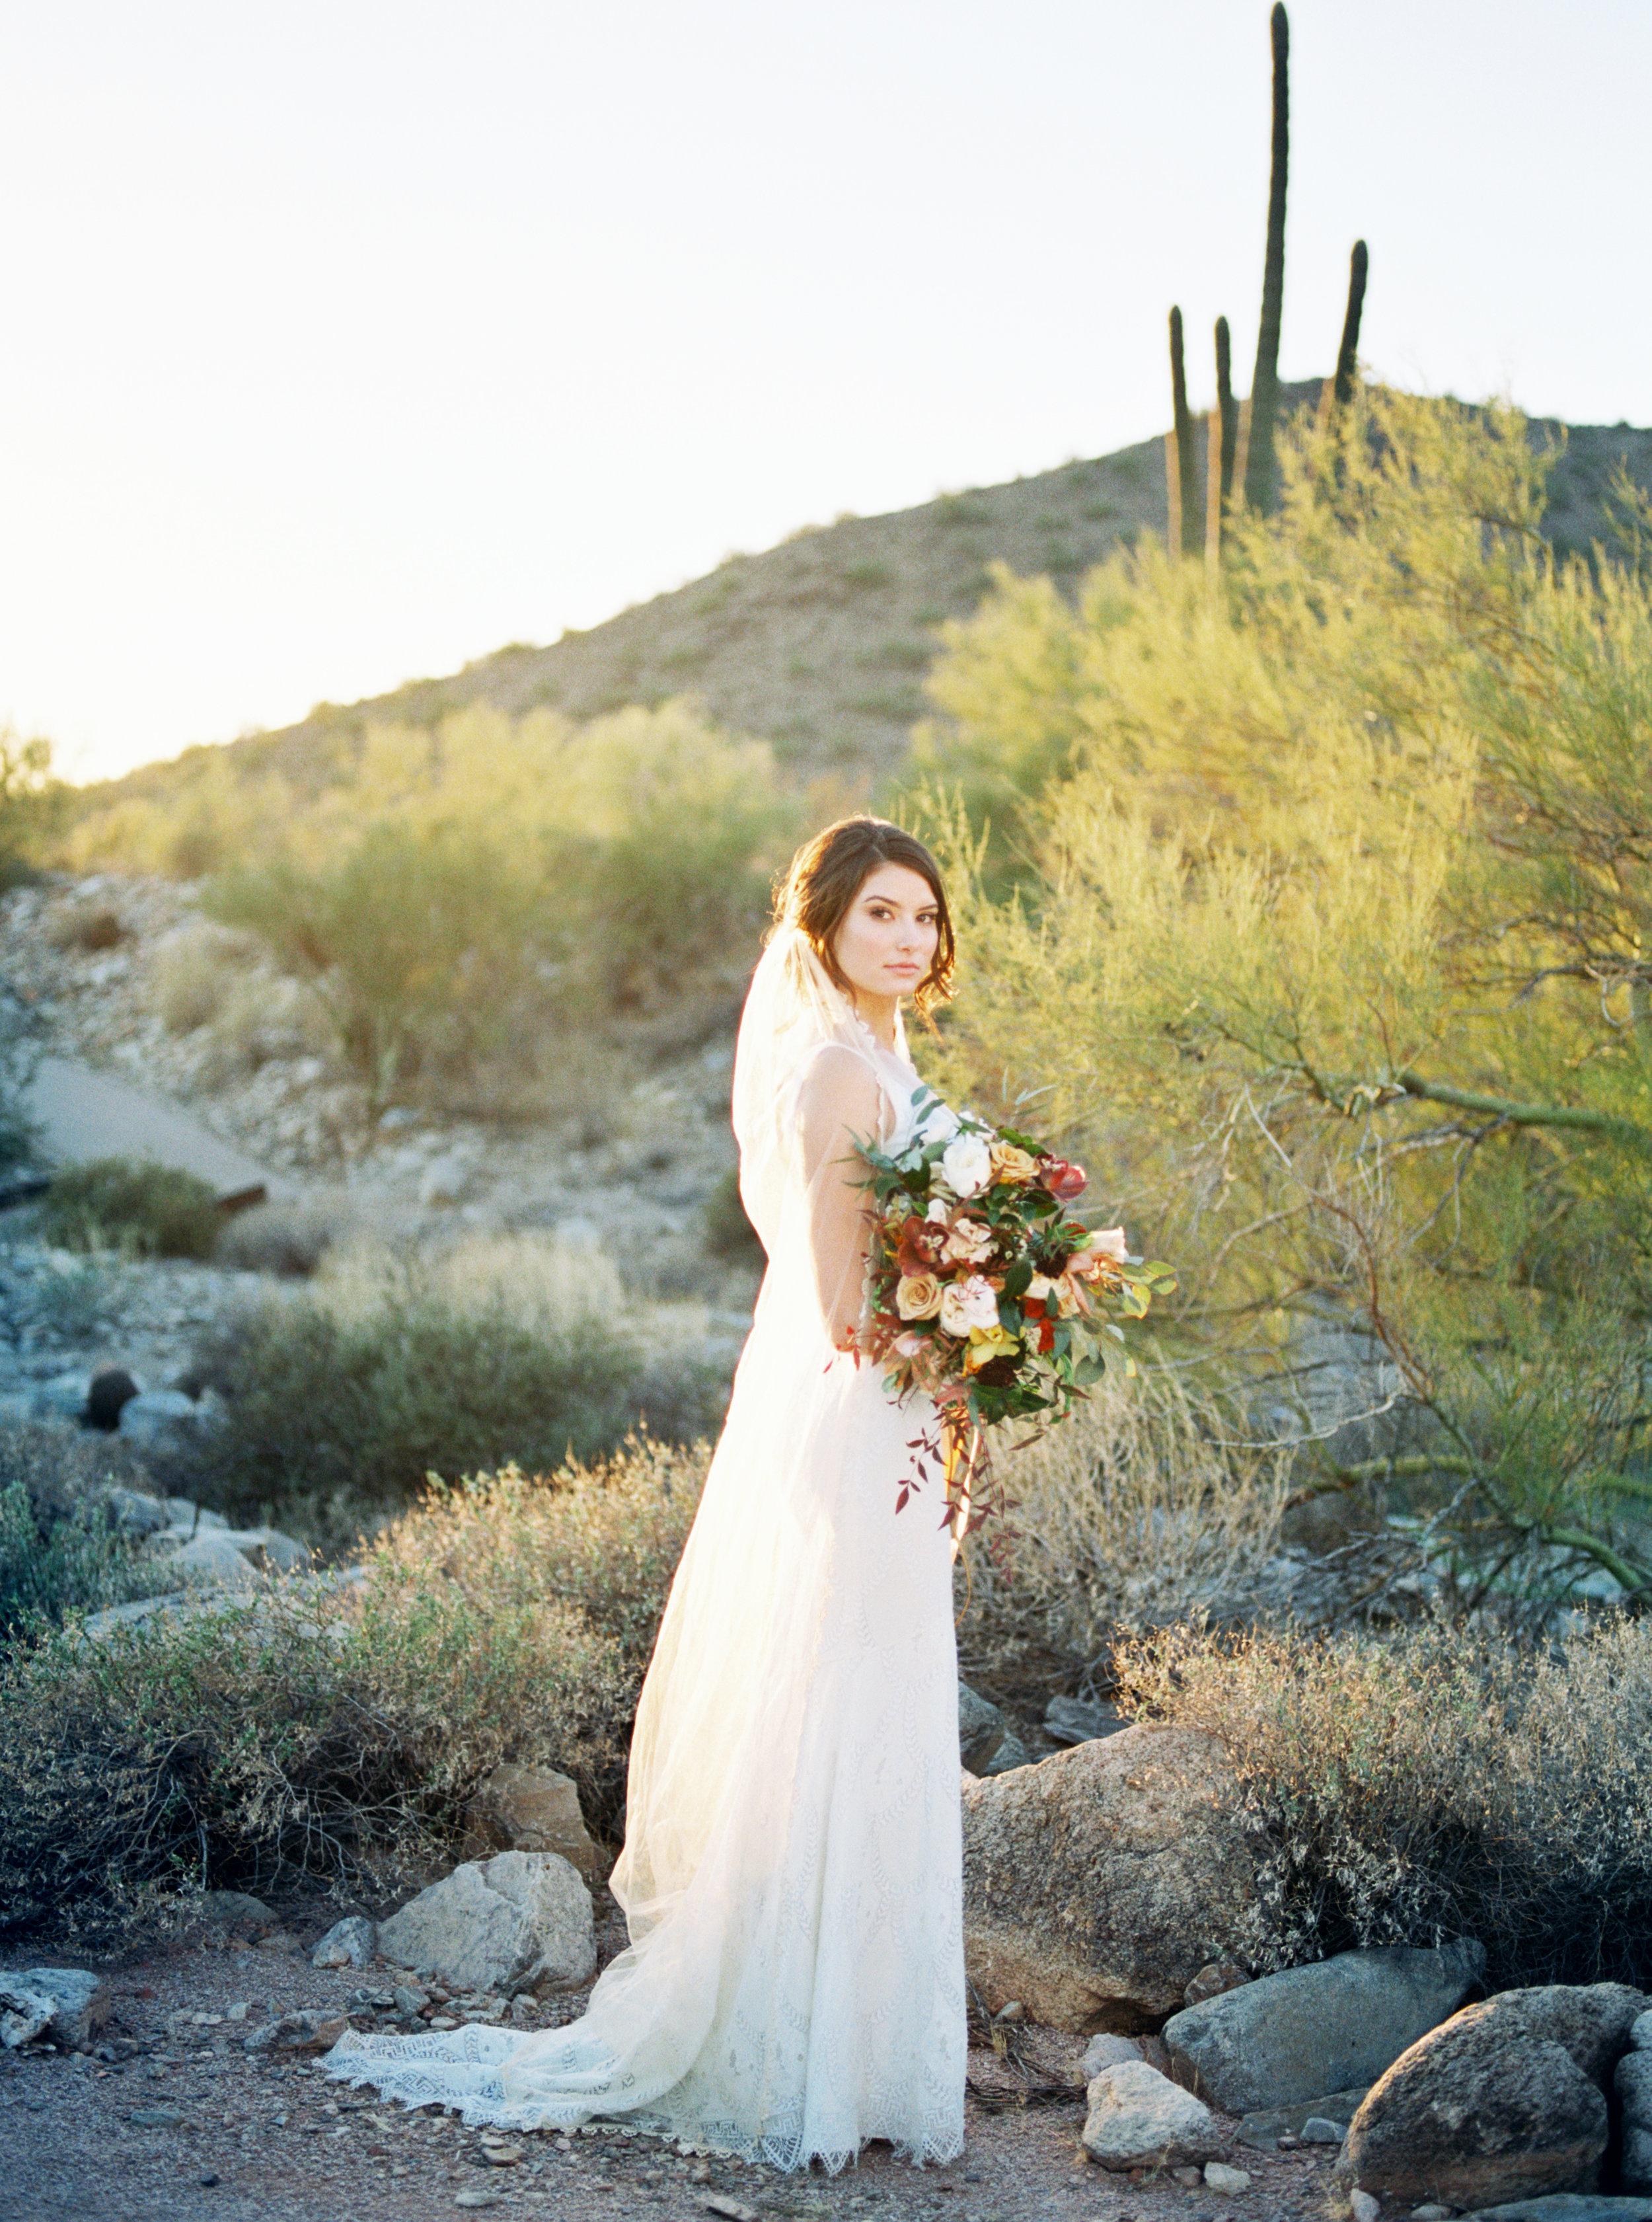 TaraBielecki_Arizona_Editorial51.jpg